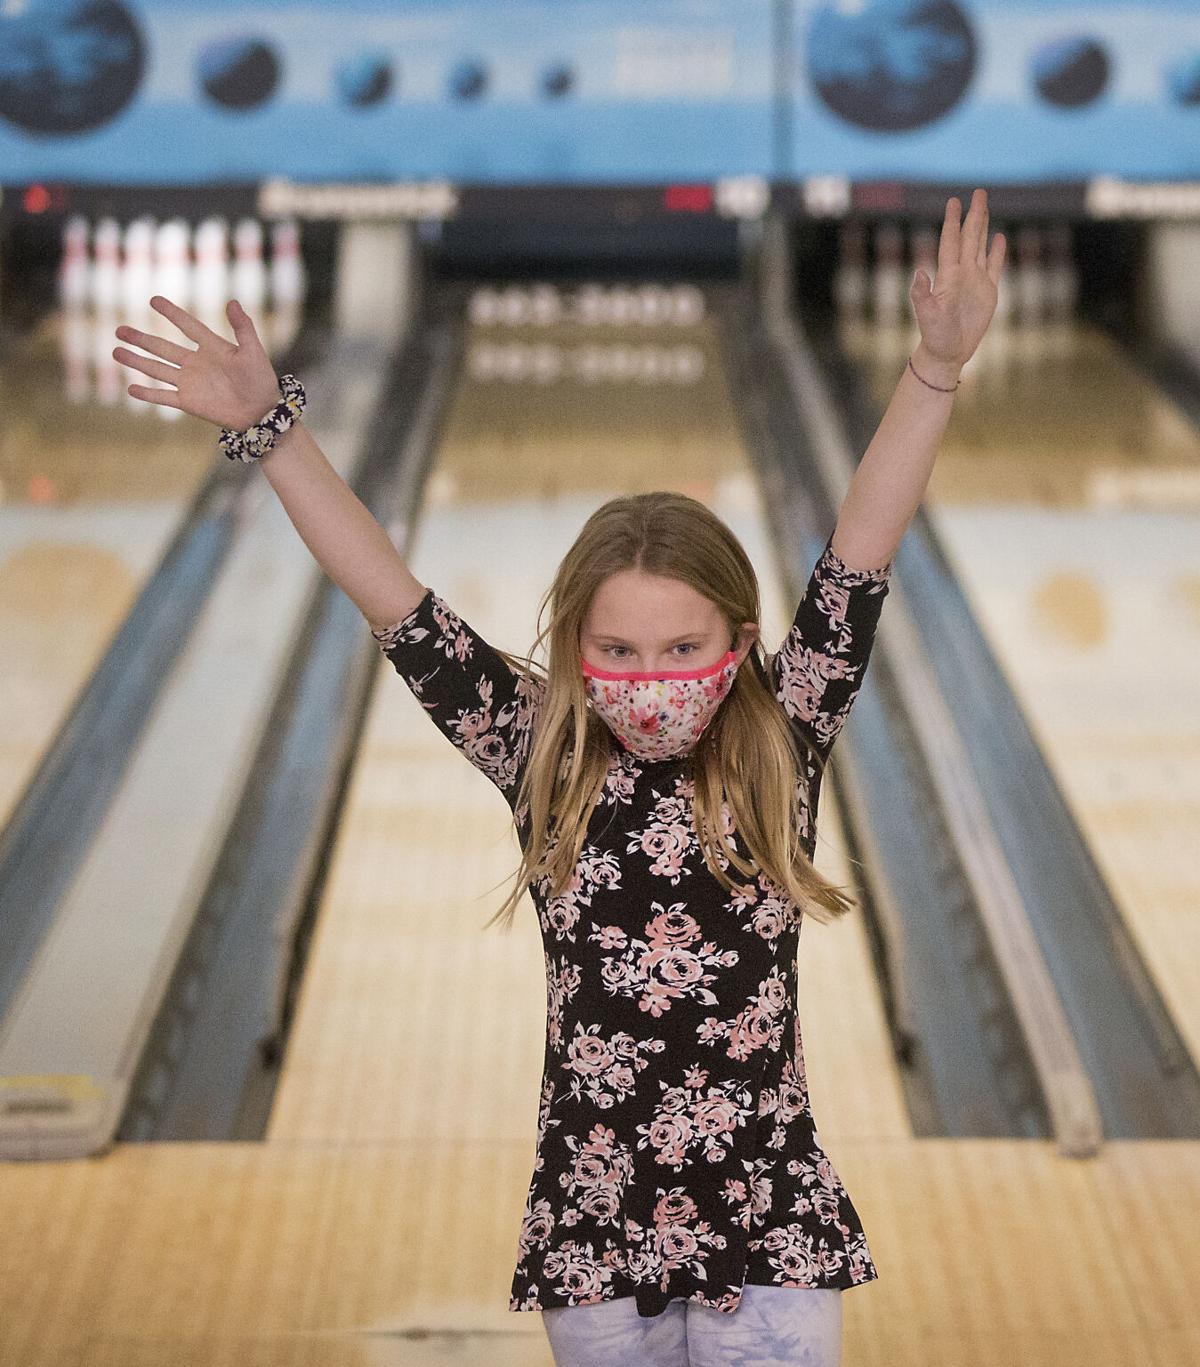 210223-newslocal-bowling 01.jpg (copy)